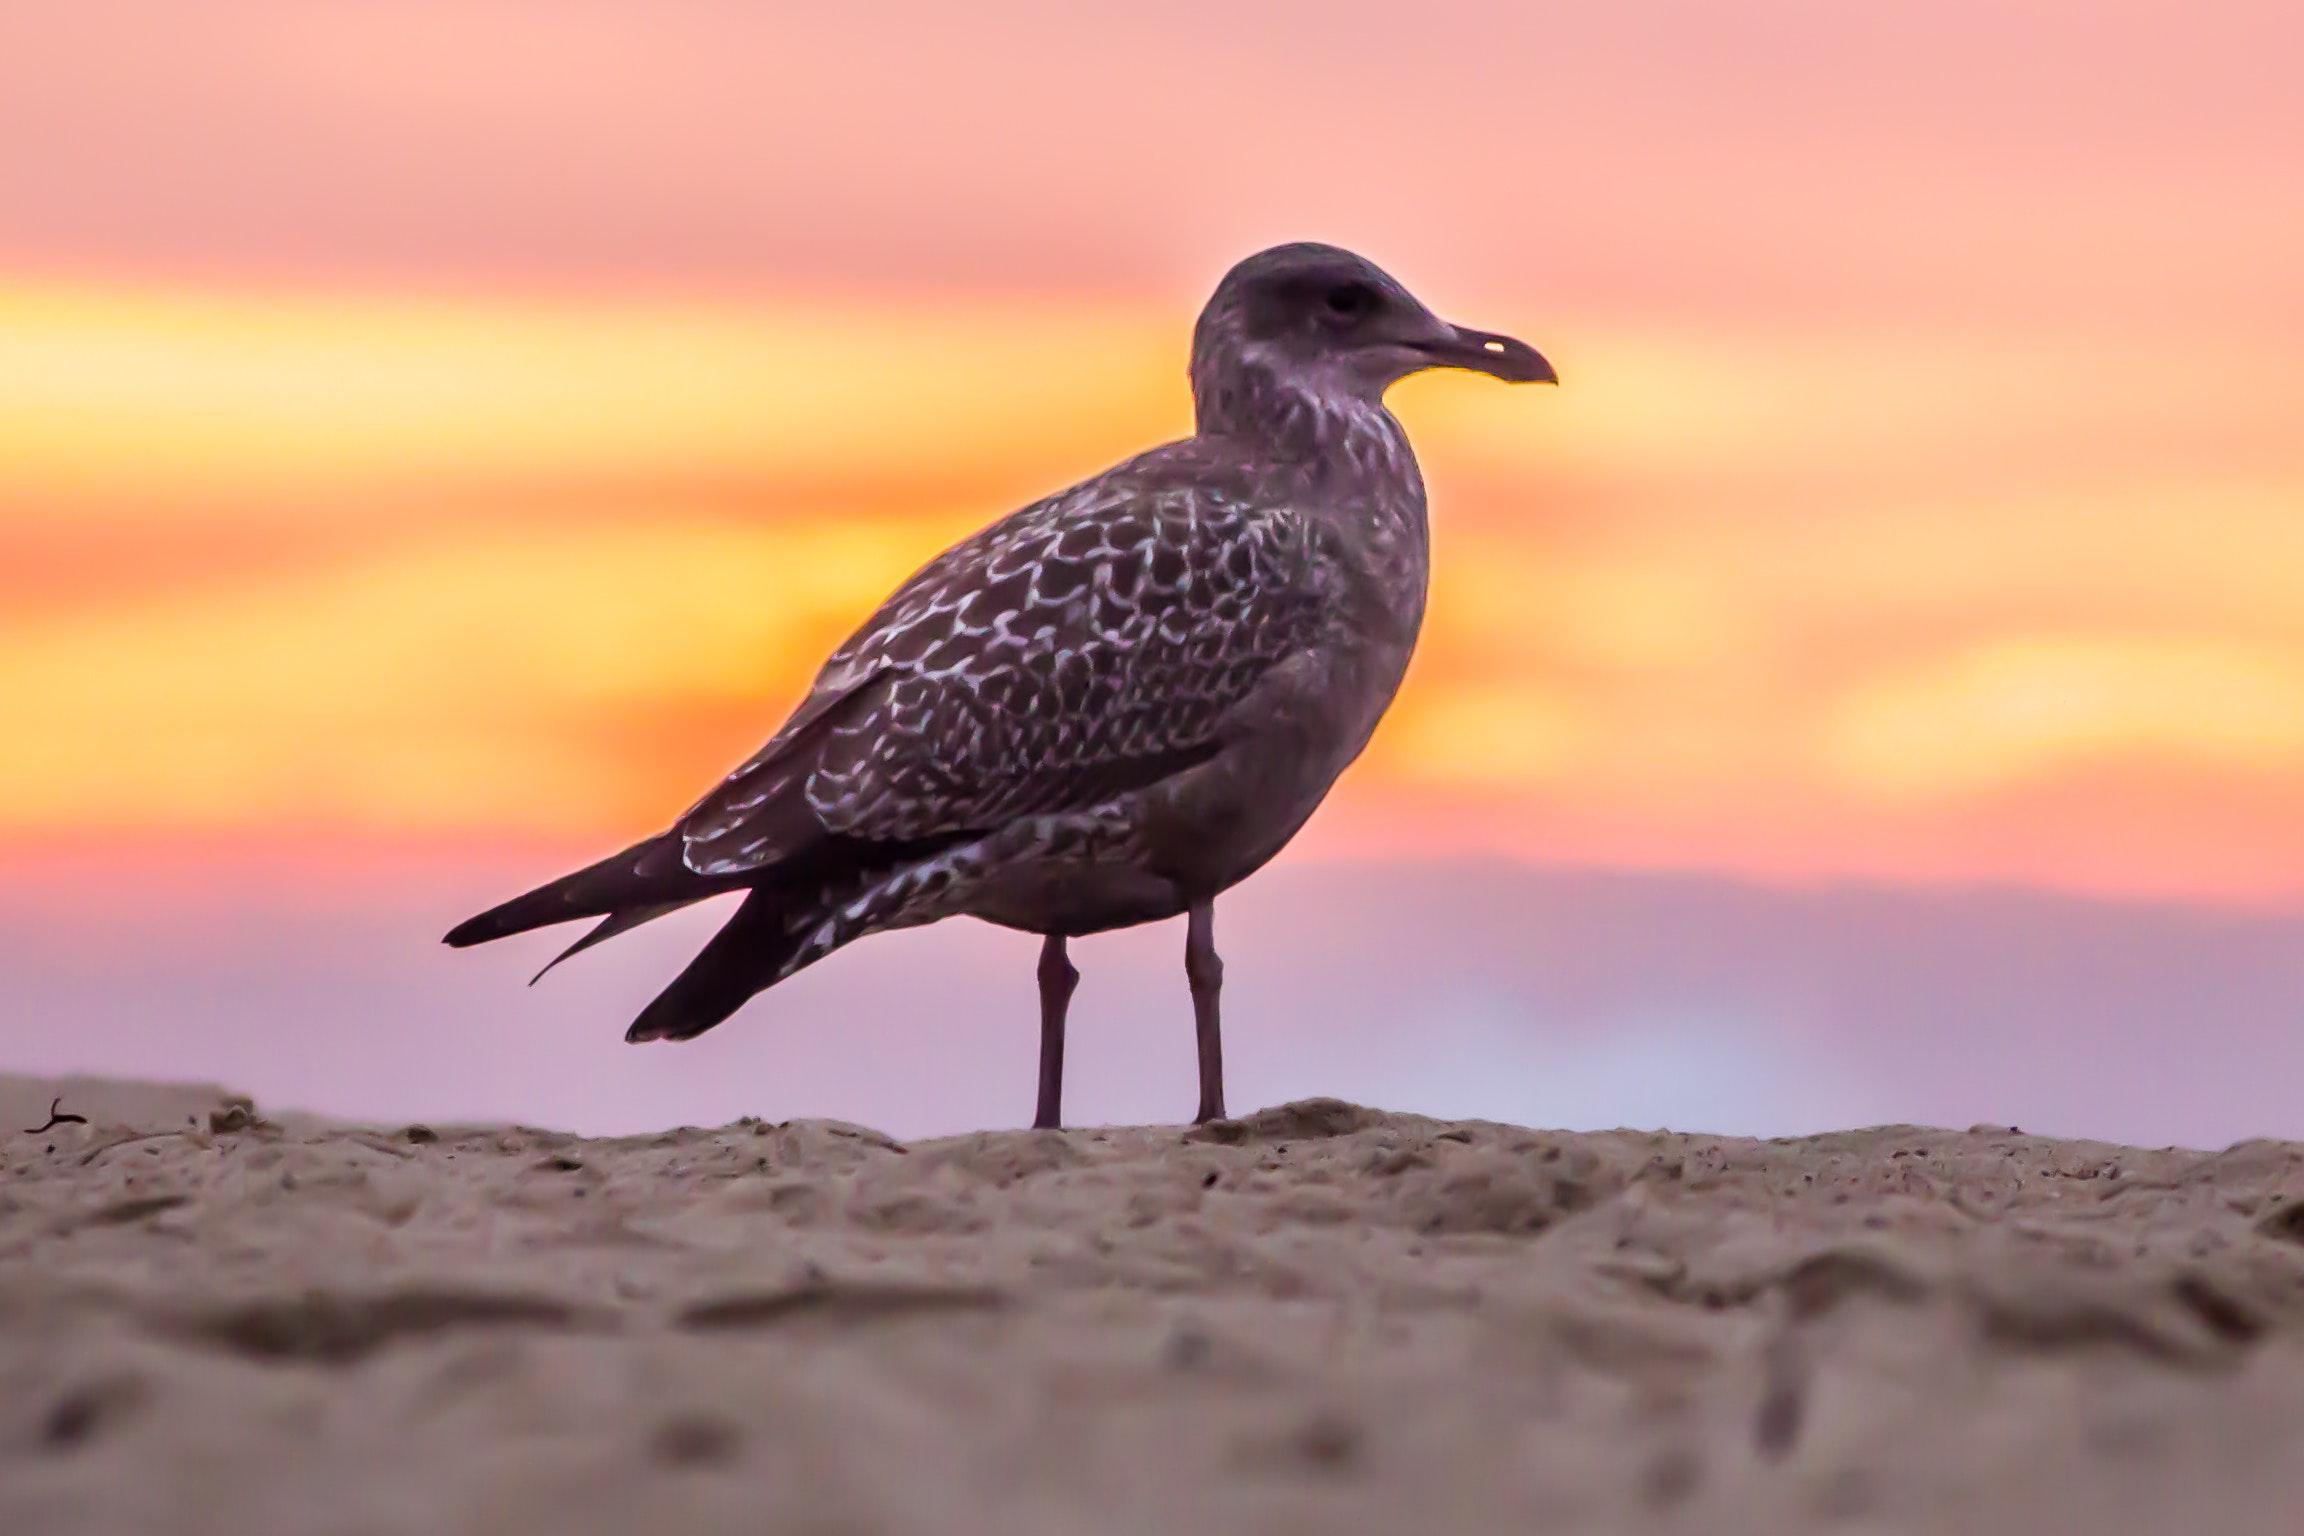 Grey bird on white beach sand photo